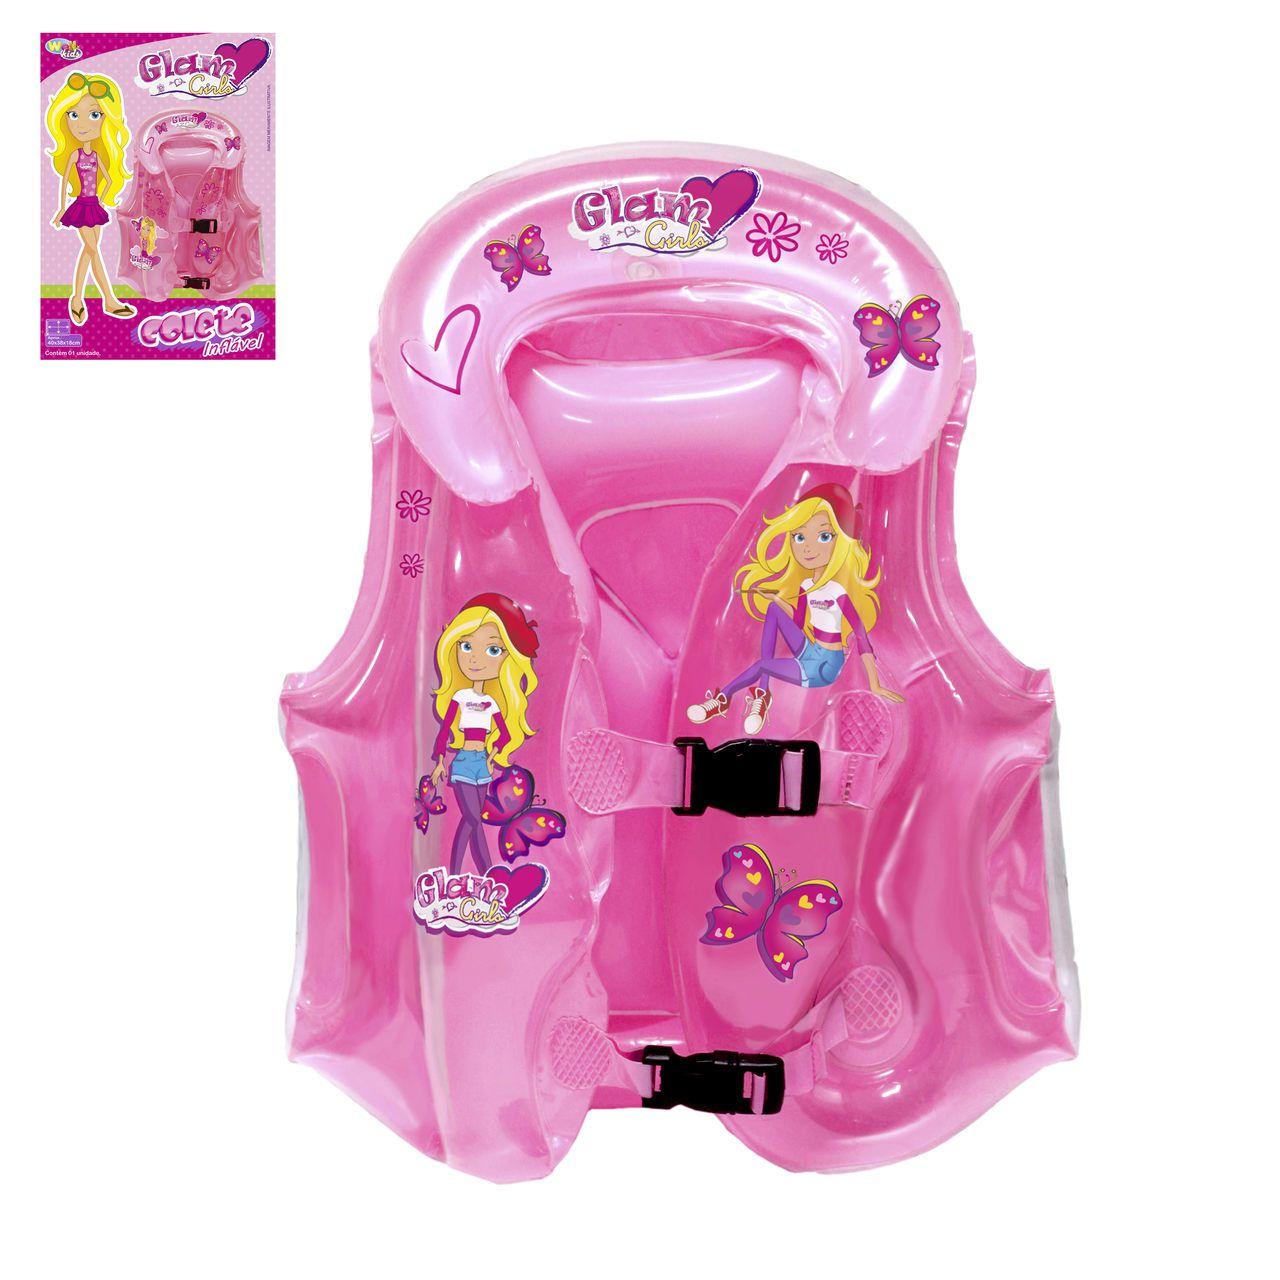 Colete Inflável Infantil c/ Encosto Menina Rosa